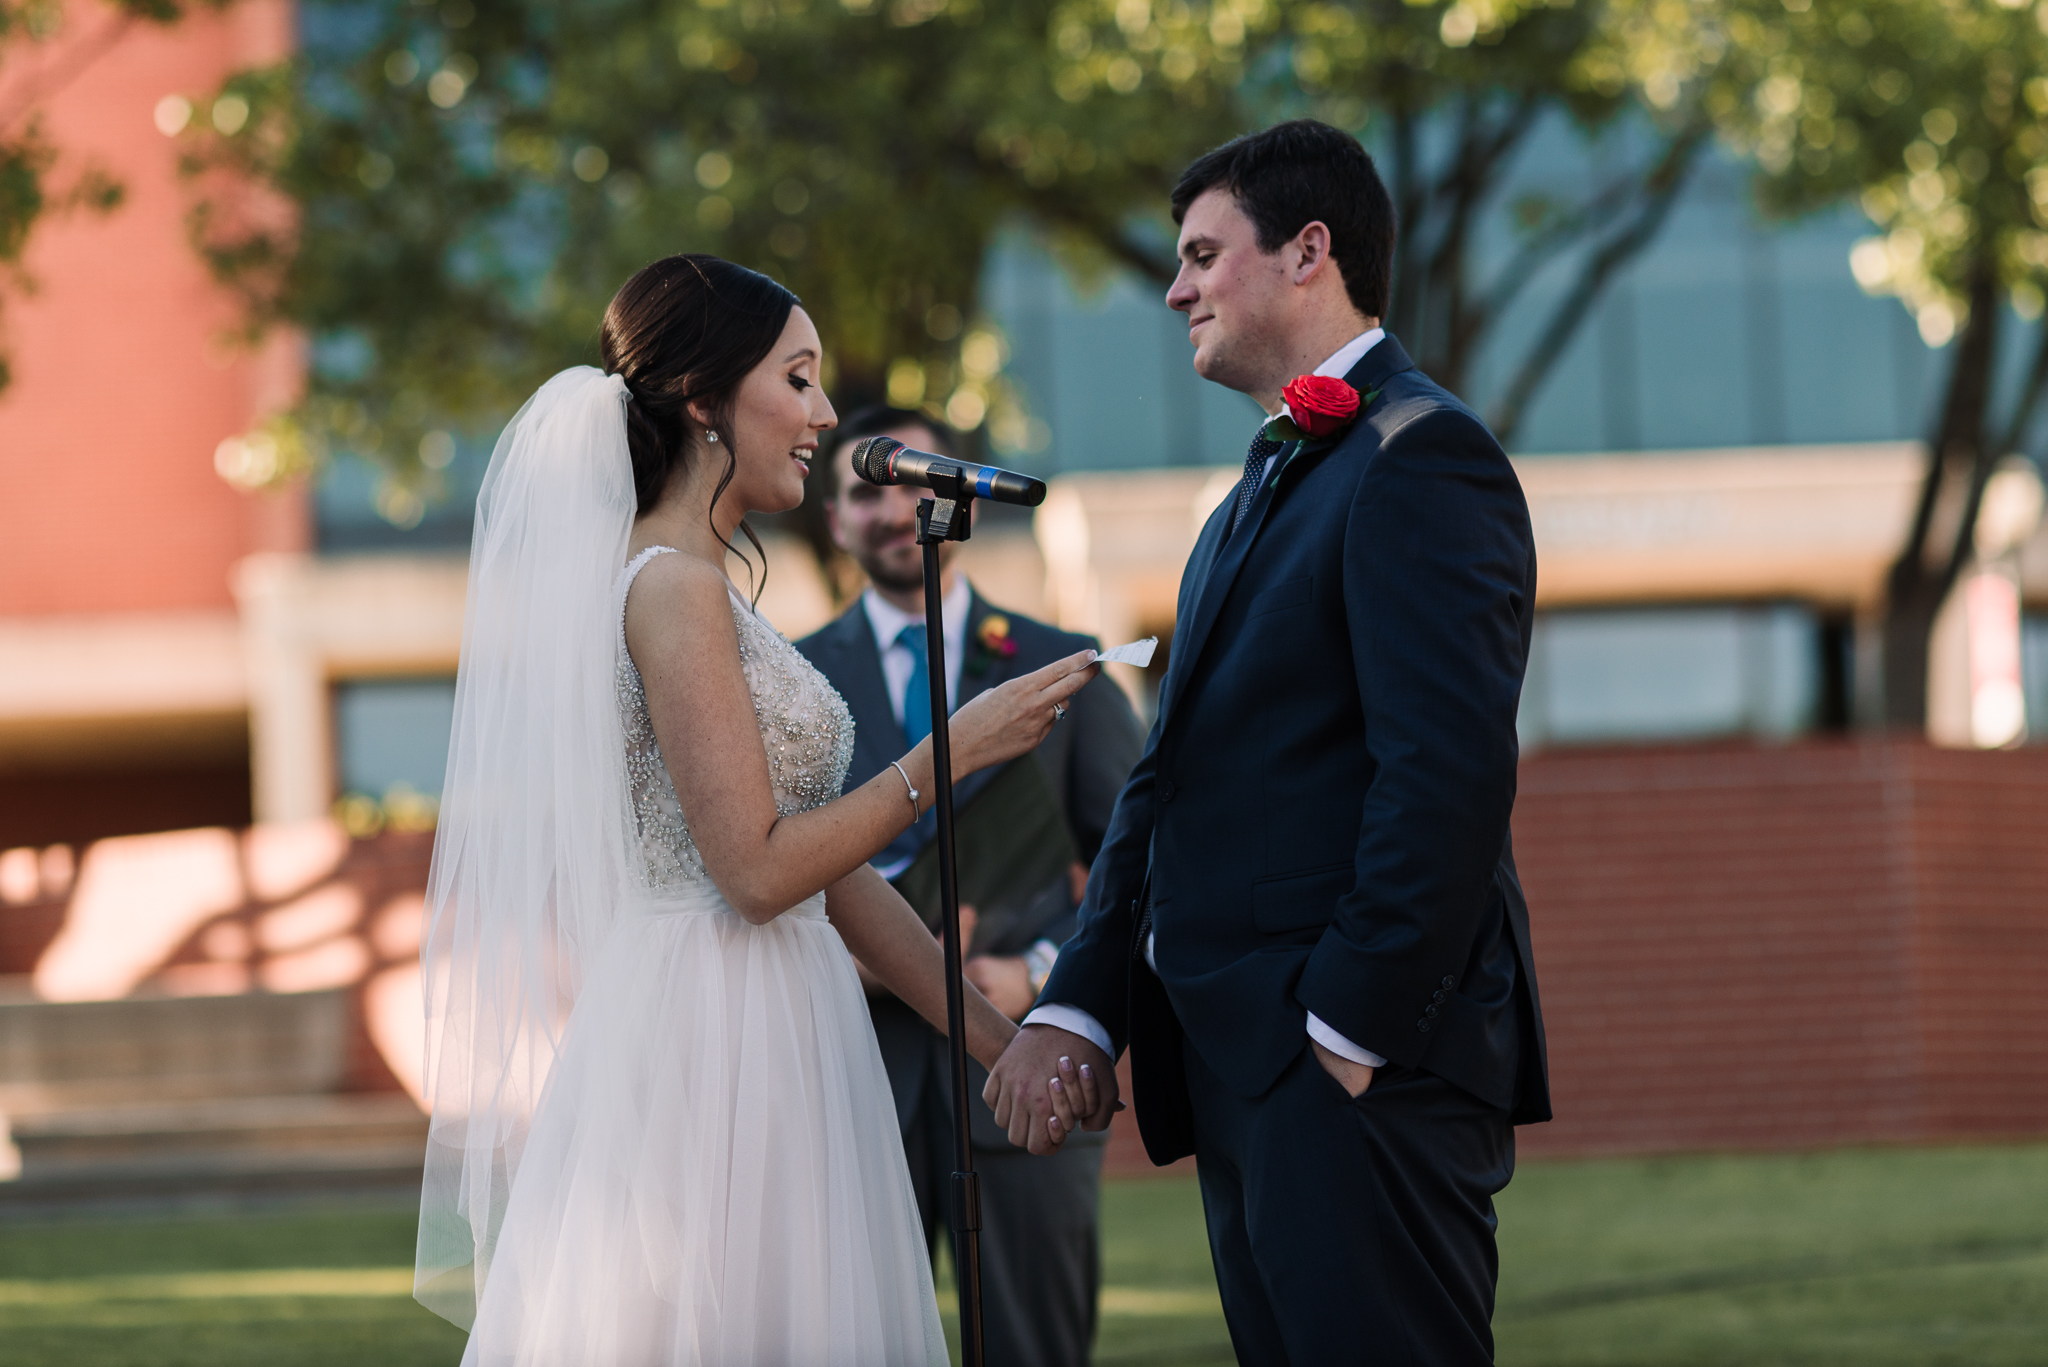 Oklahoma-Christian-University-Wedding-0445.jpg